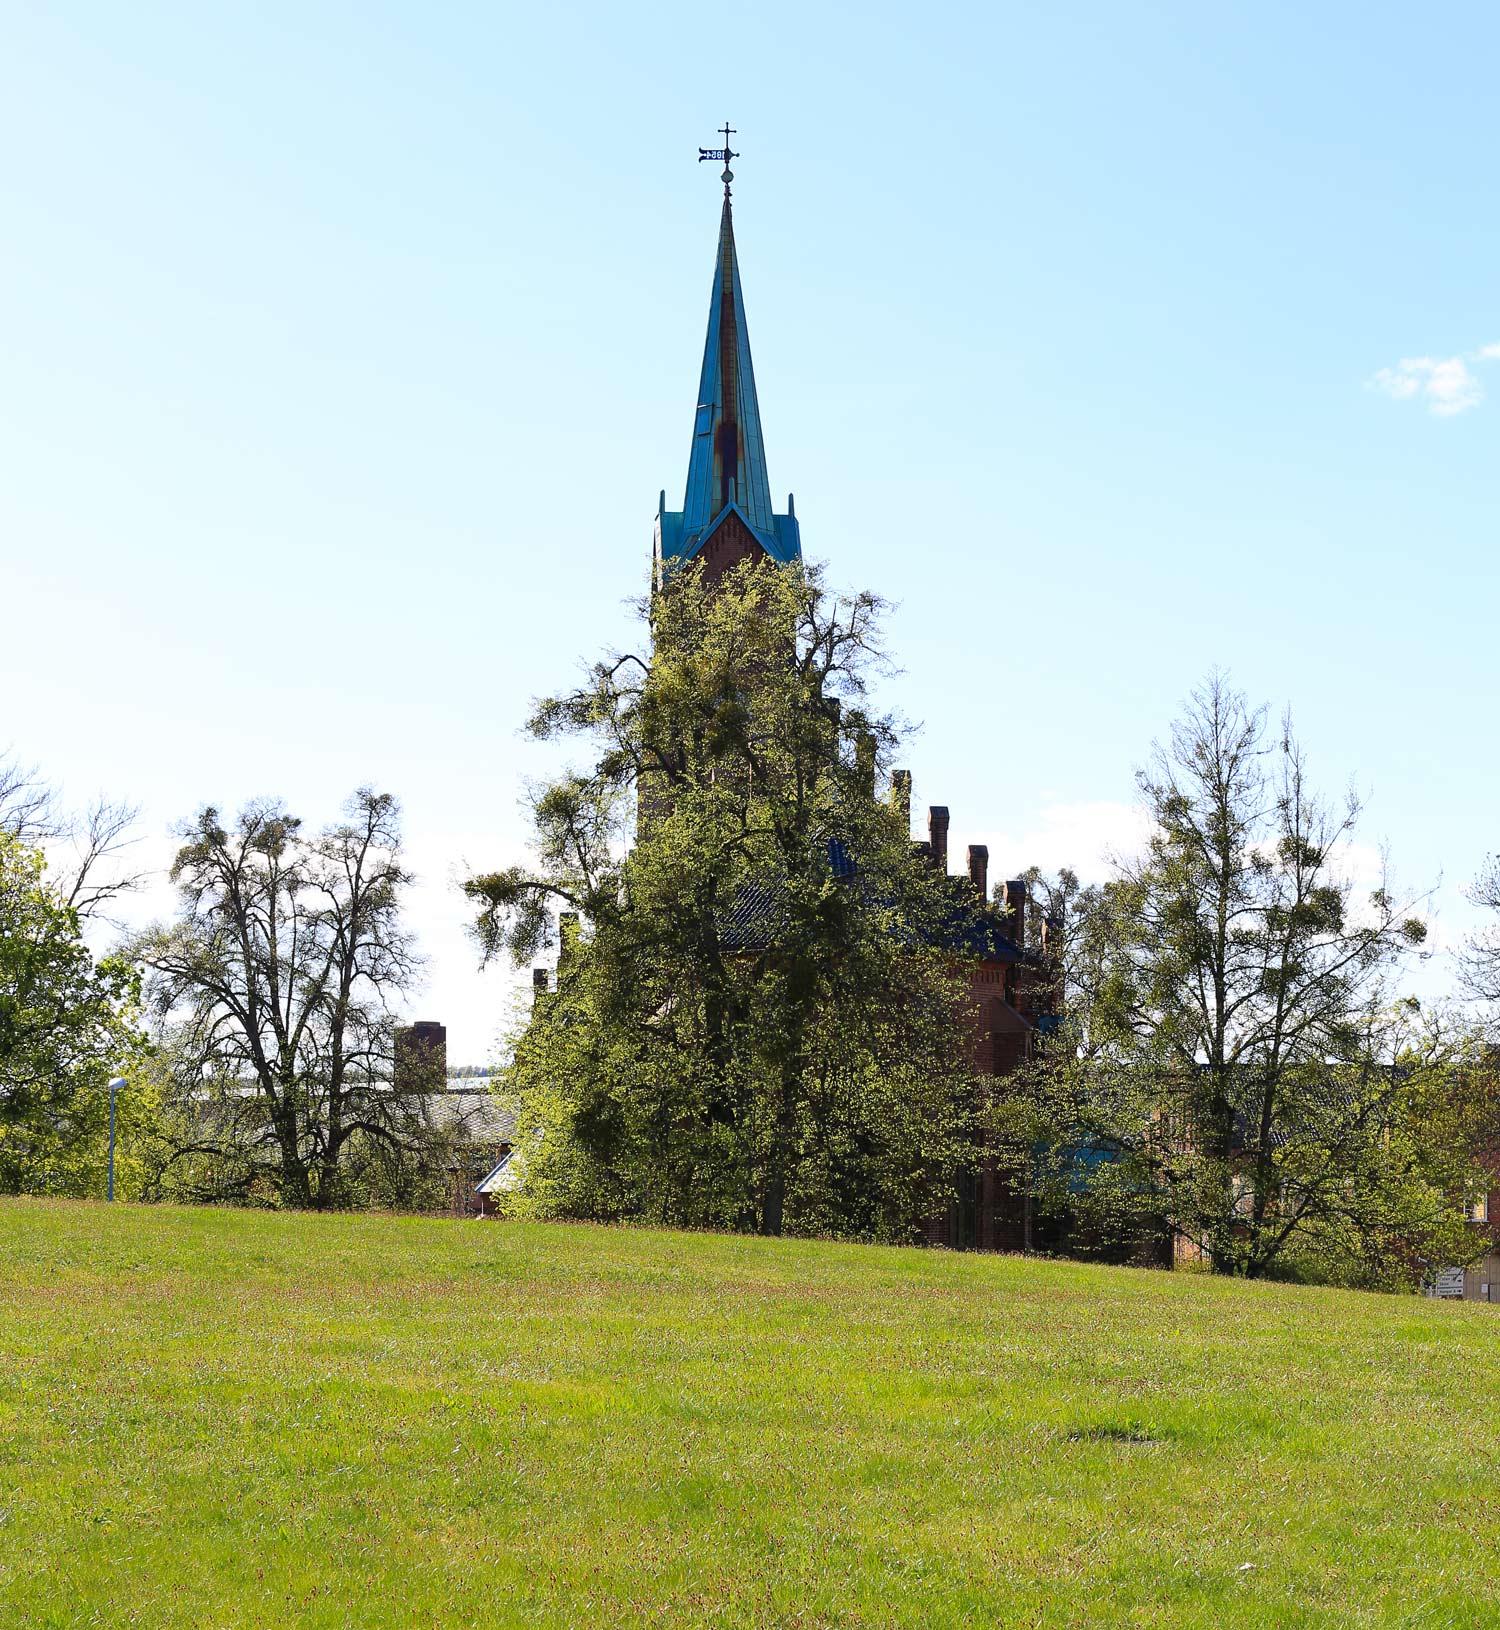 karljohansvern-kirke-1O2A4462.jpg